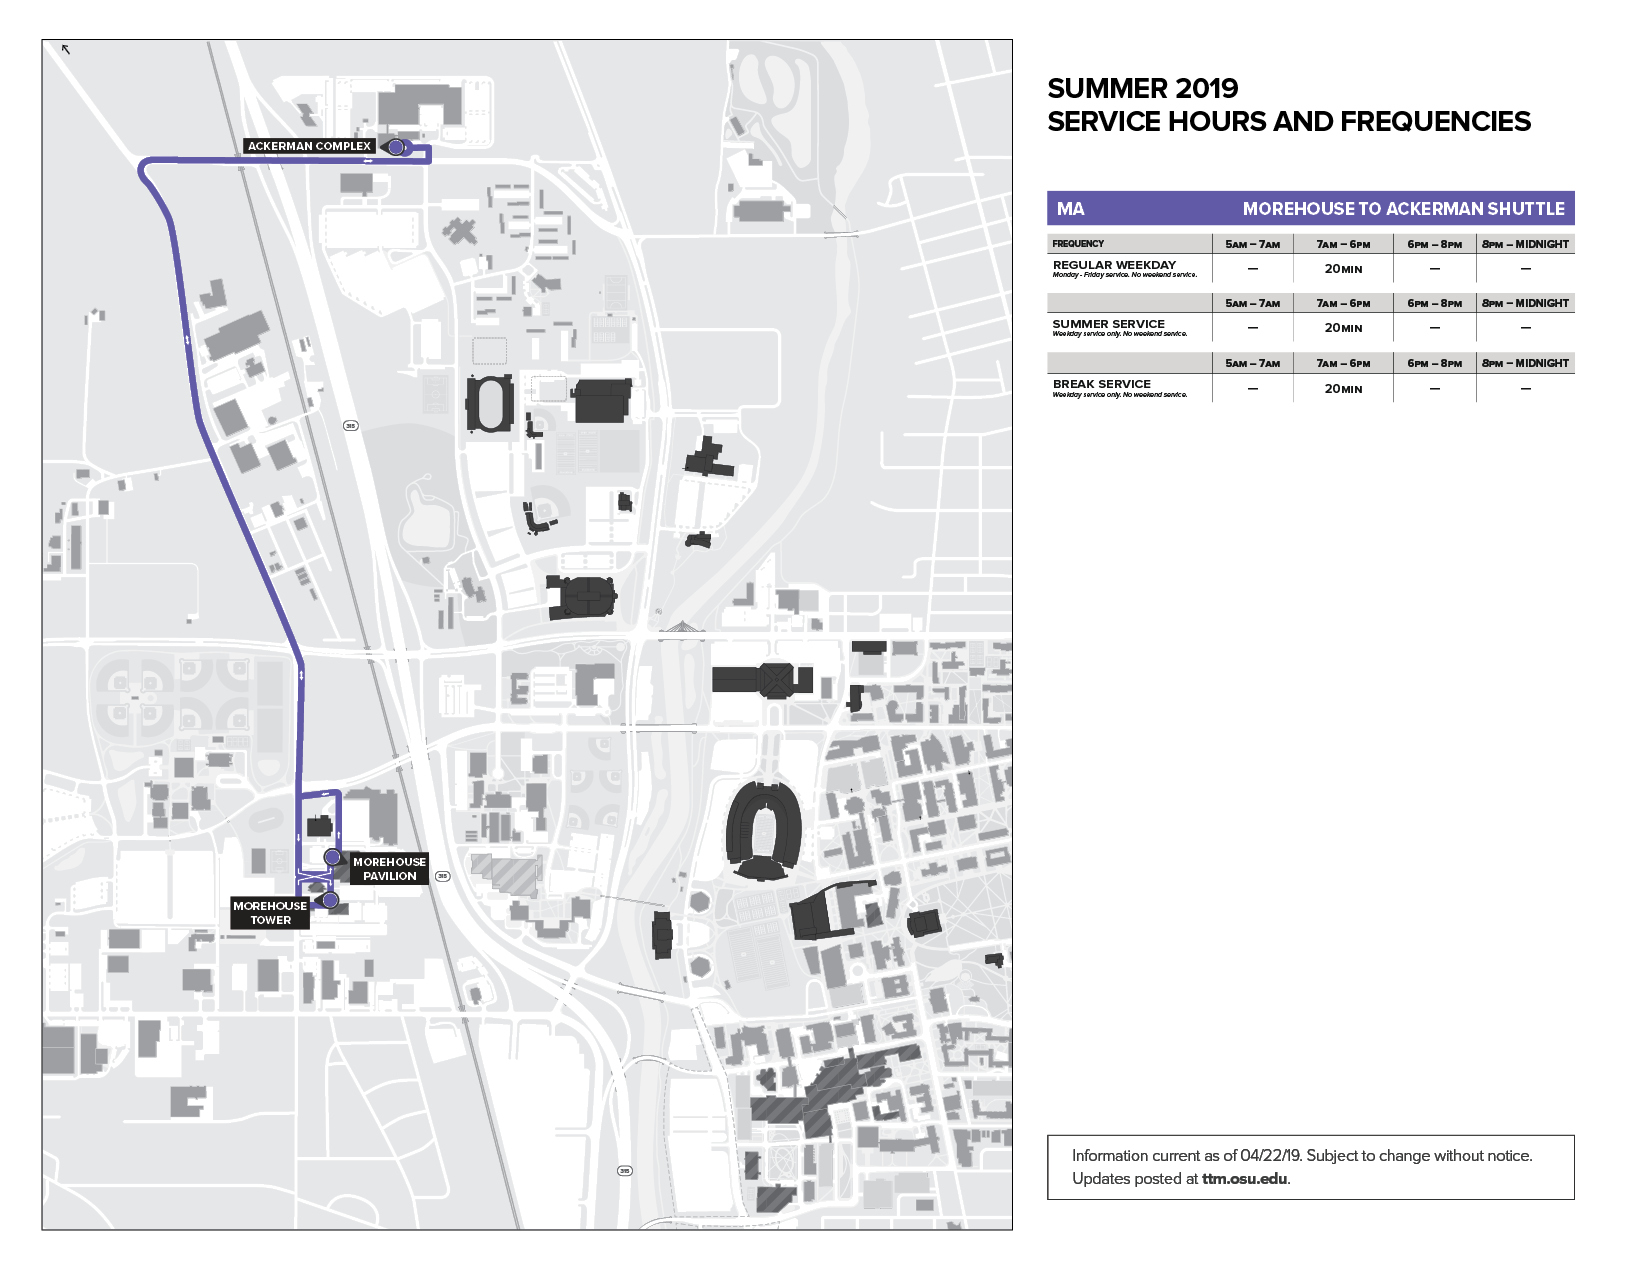 CABS Routes Detoured June 1 for College Road Closure